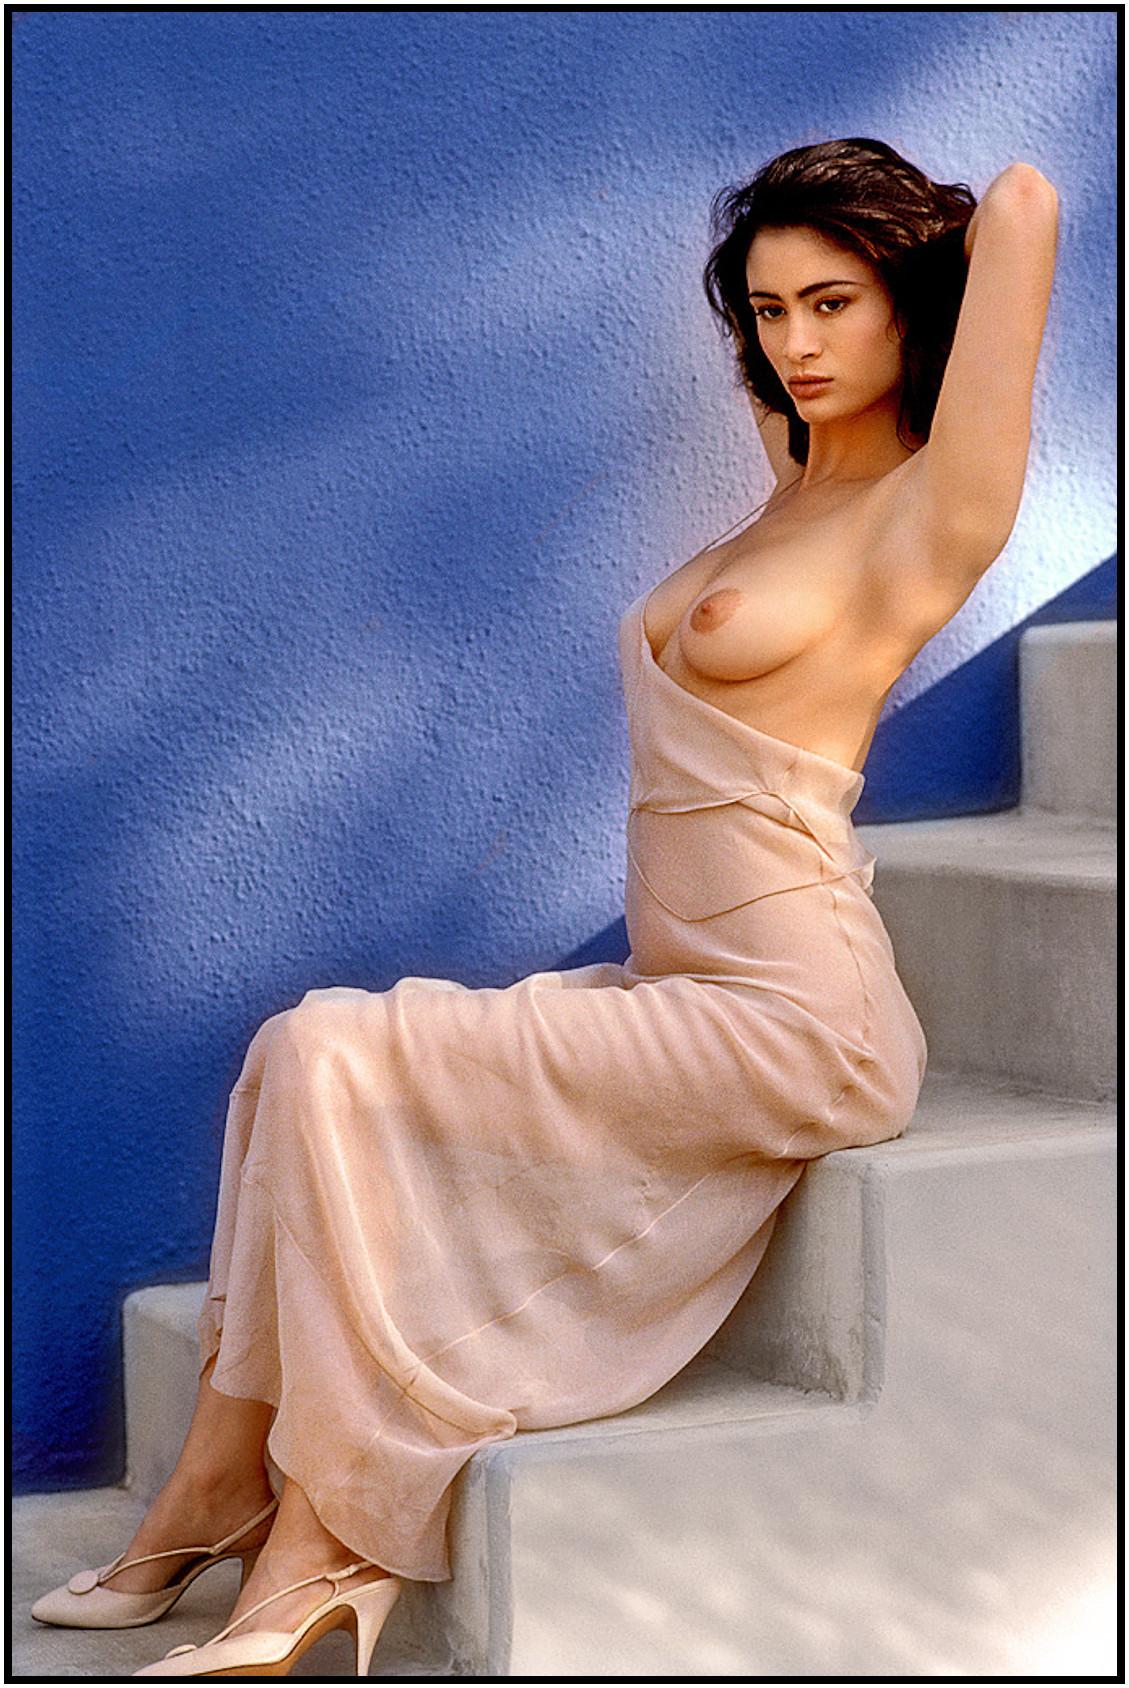 Nude hot girls album teacher